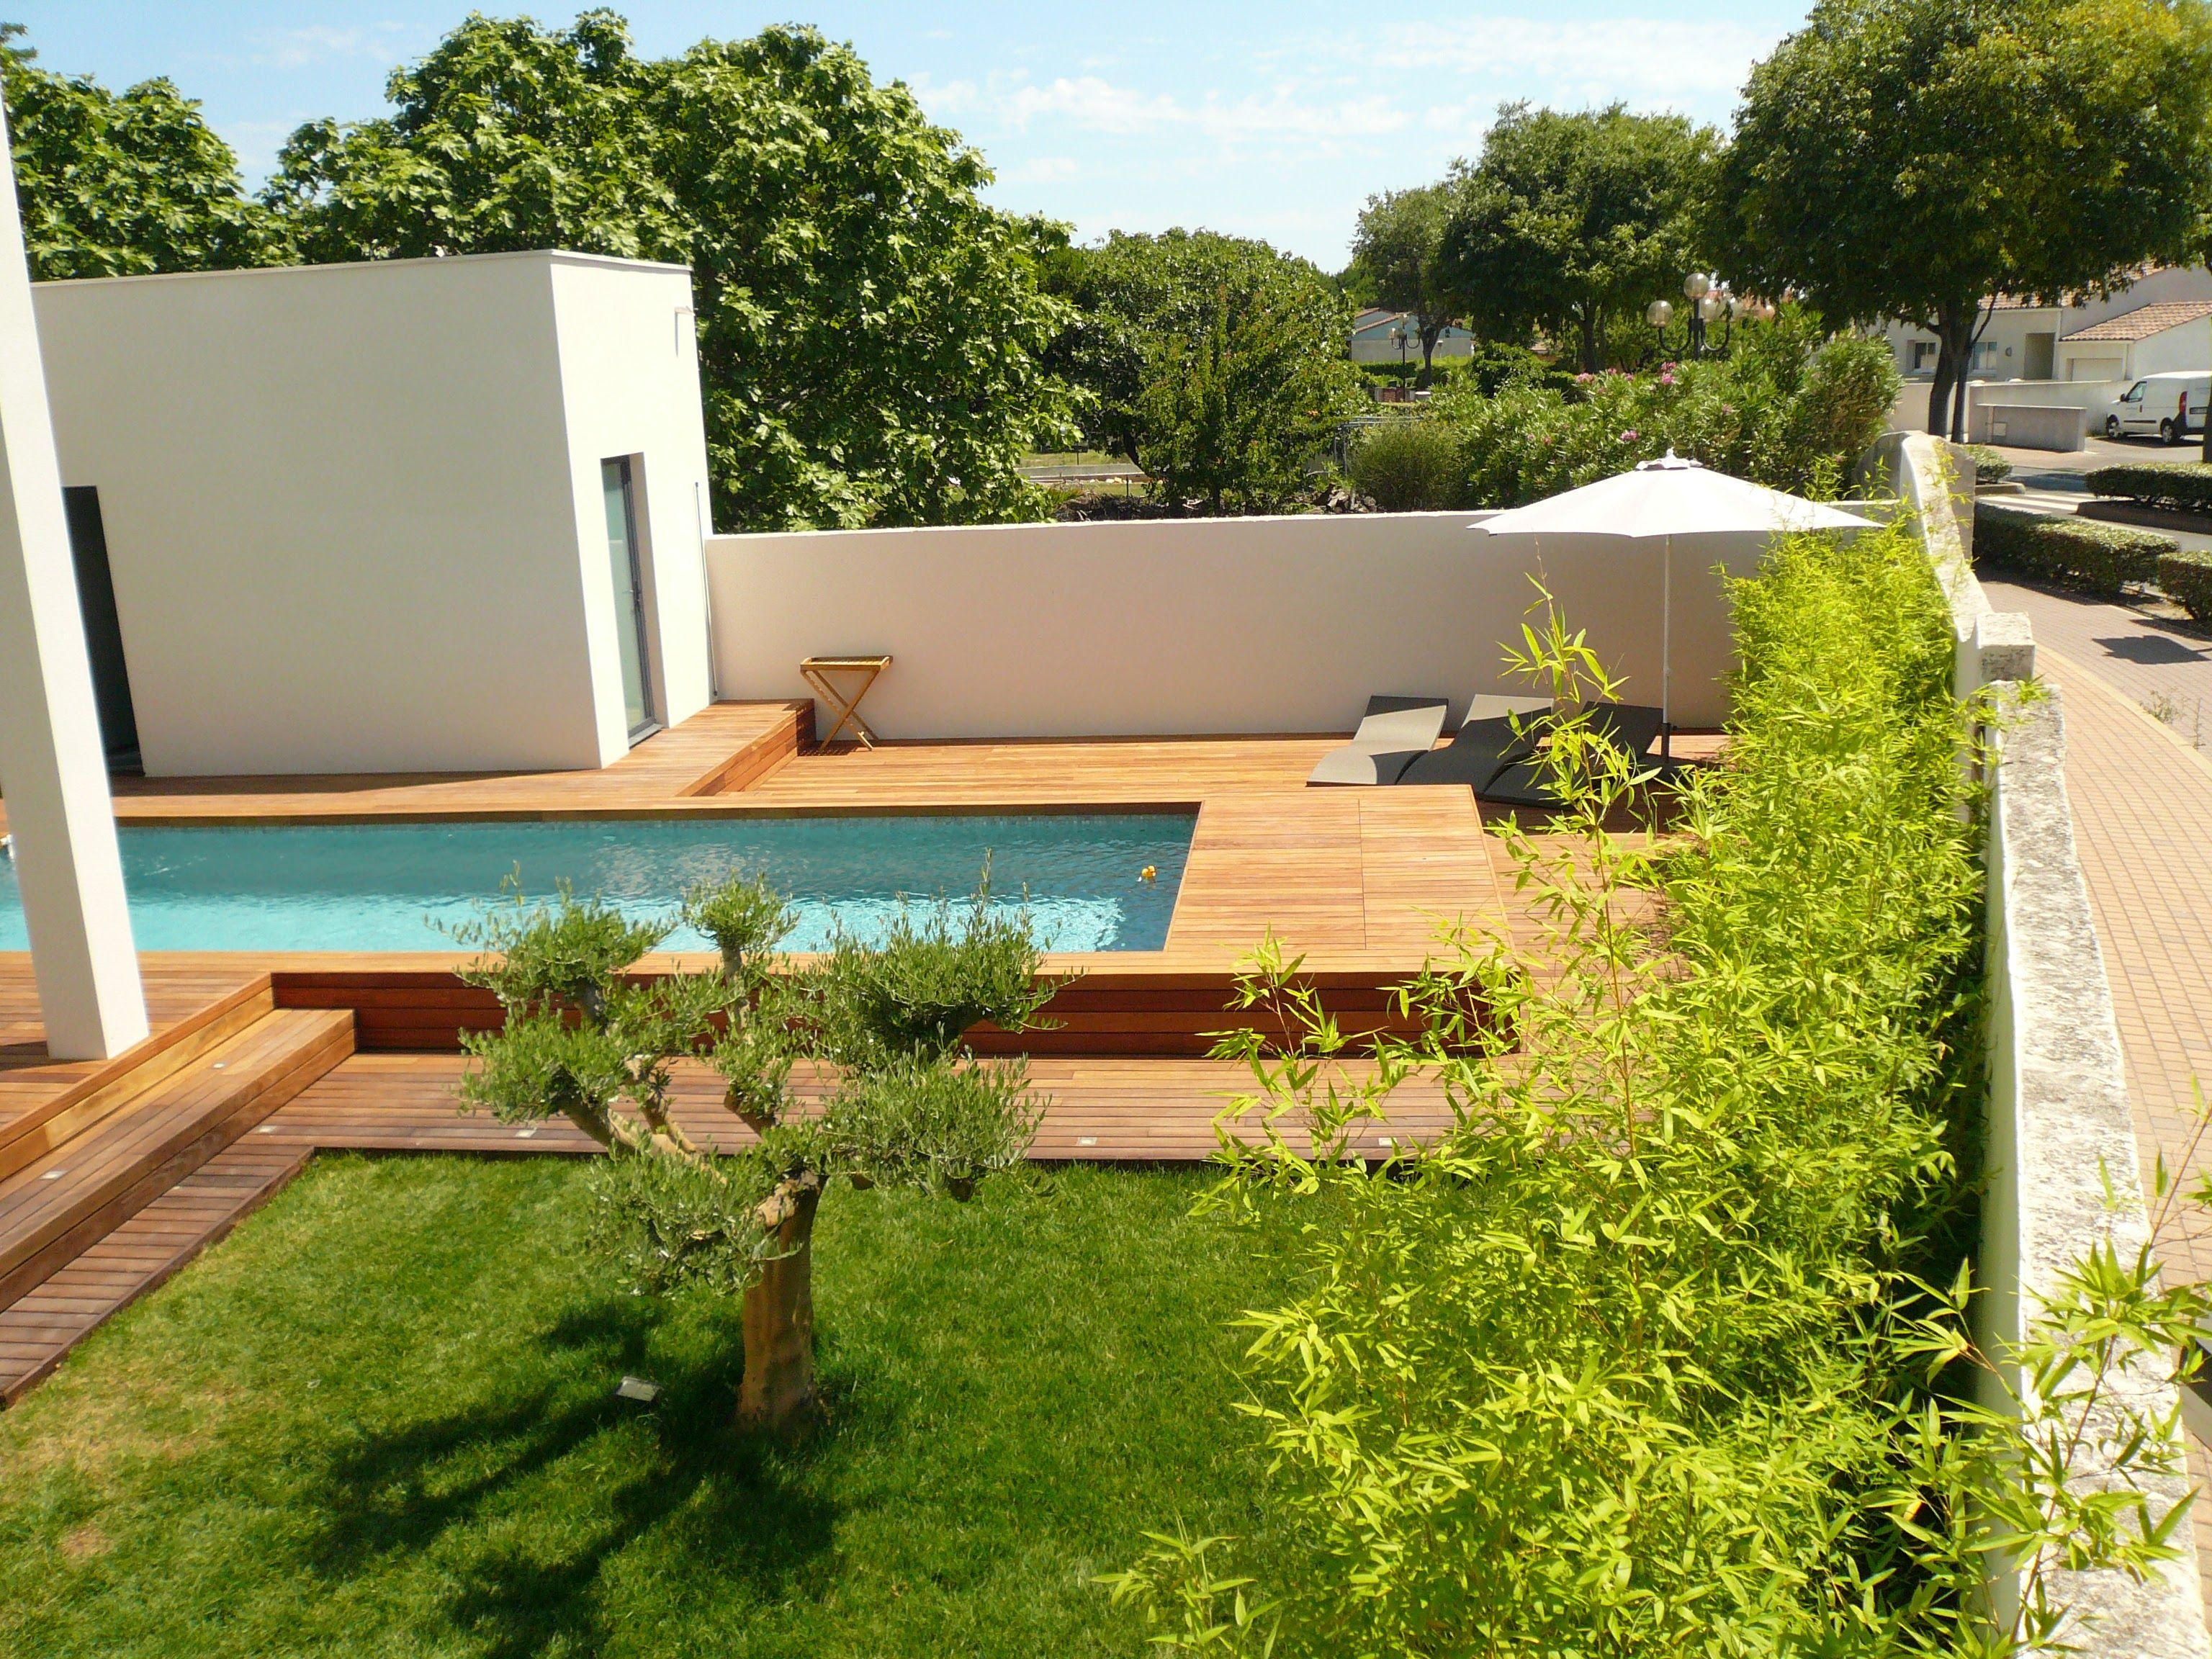 Terrasse De Piscine Ipe Visserie Cachee Margelle Integree Avec